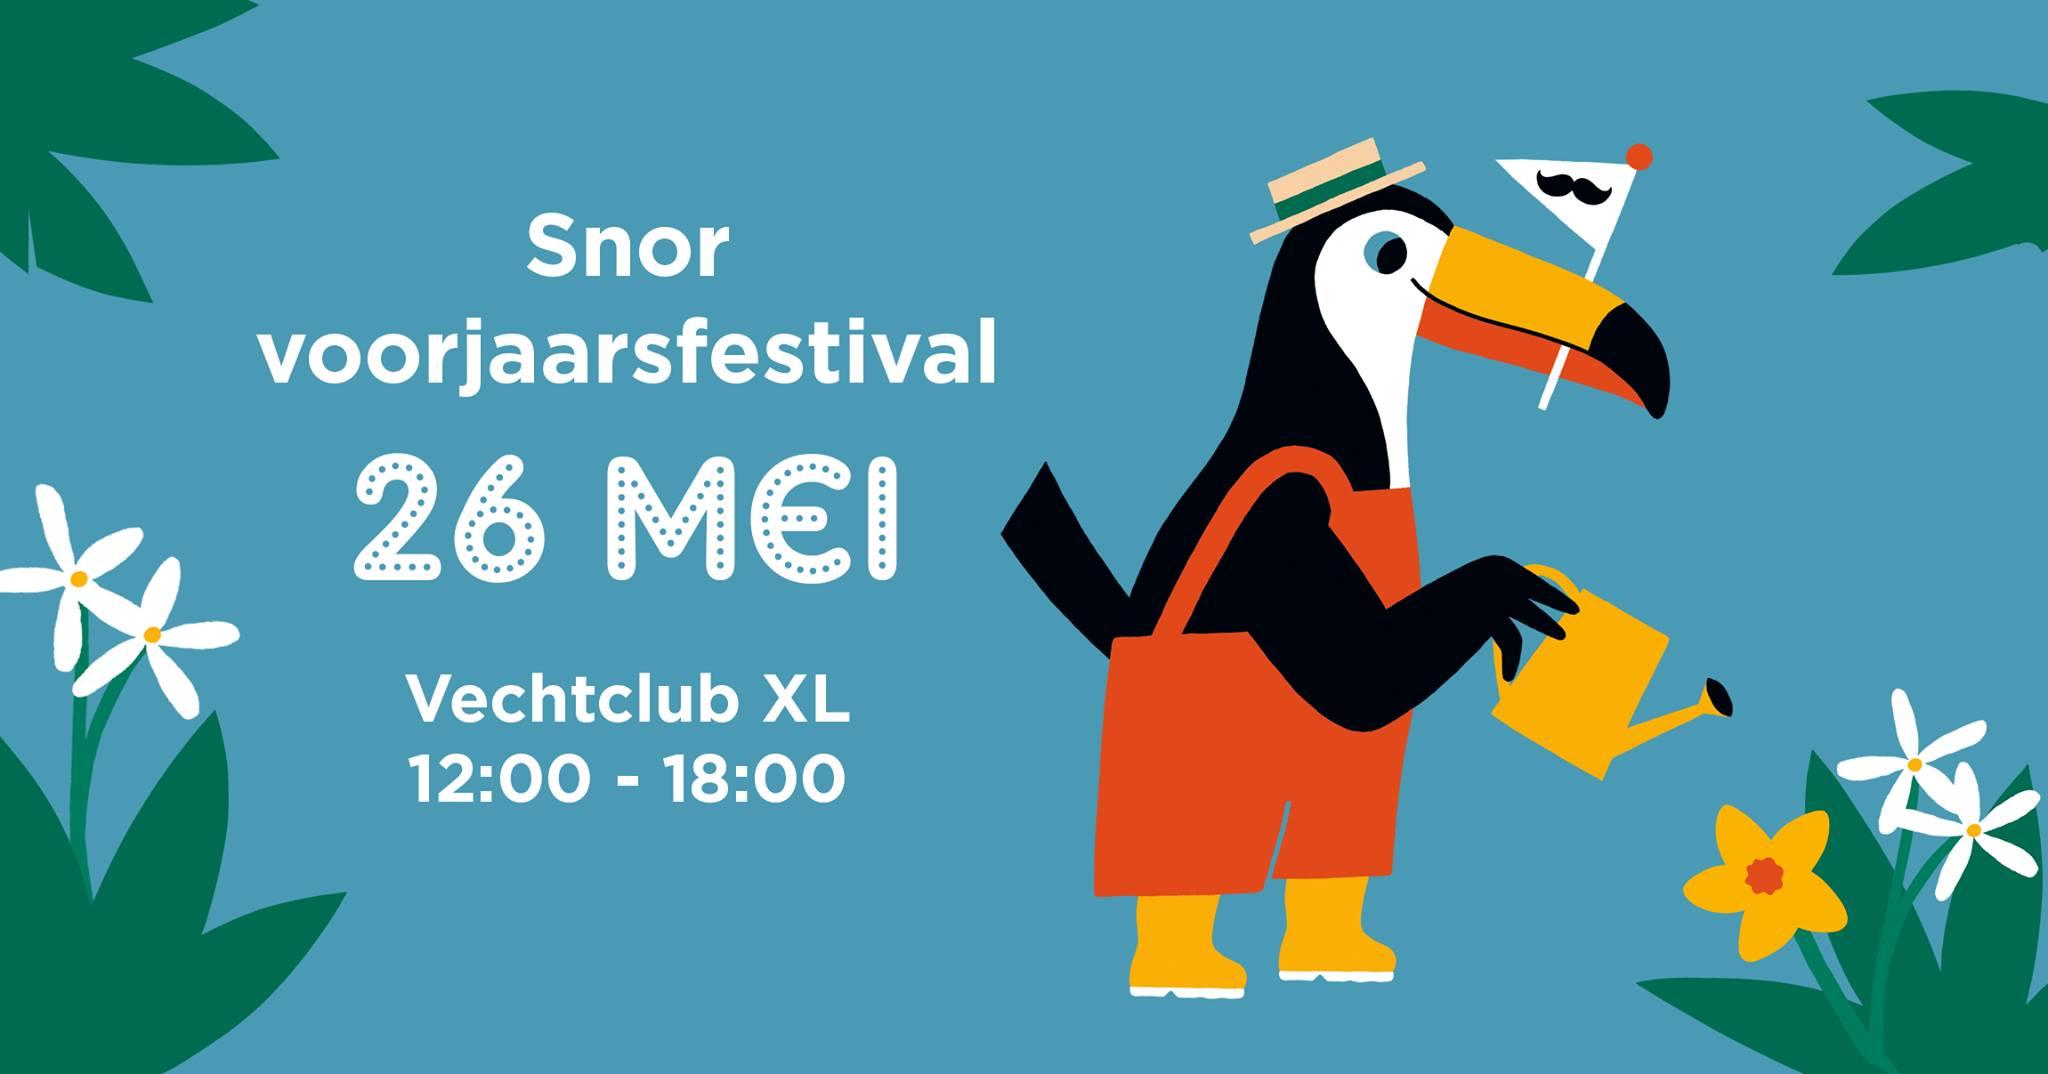 facebookheader-snorfestival-mei-2018.jpg